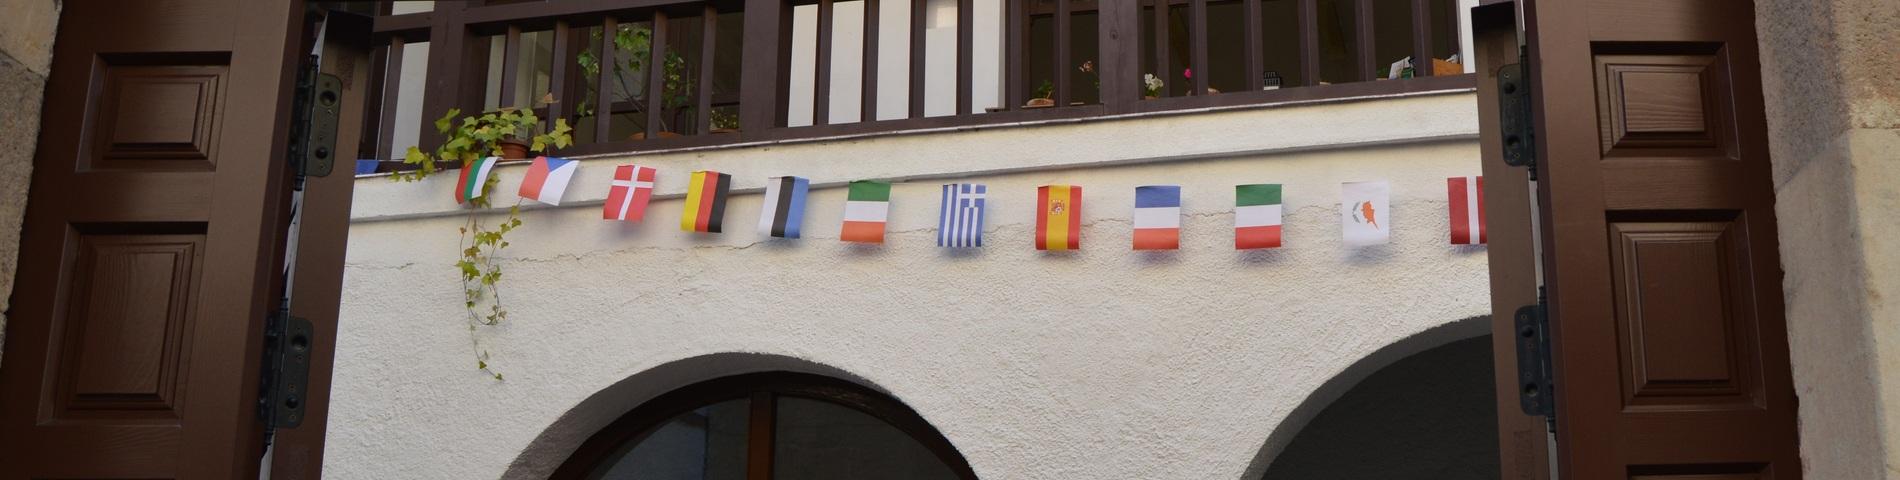 Colegio de España bild 1